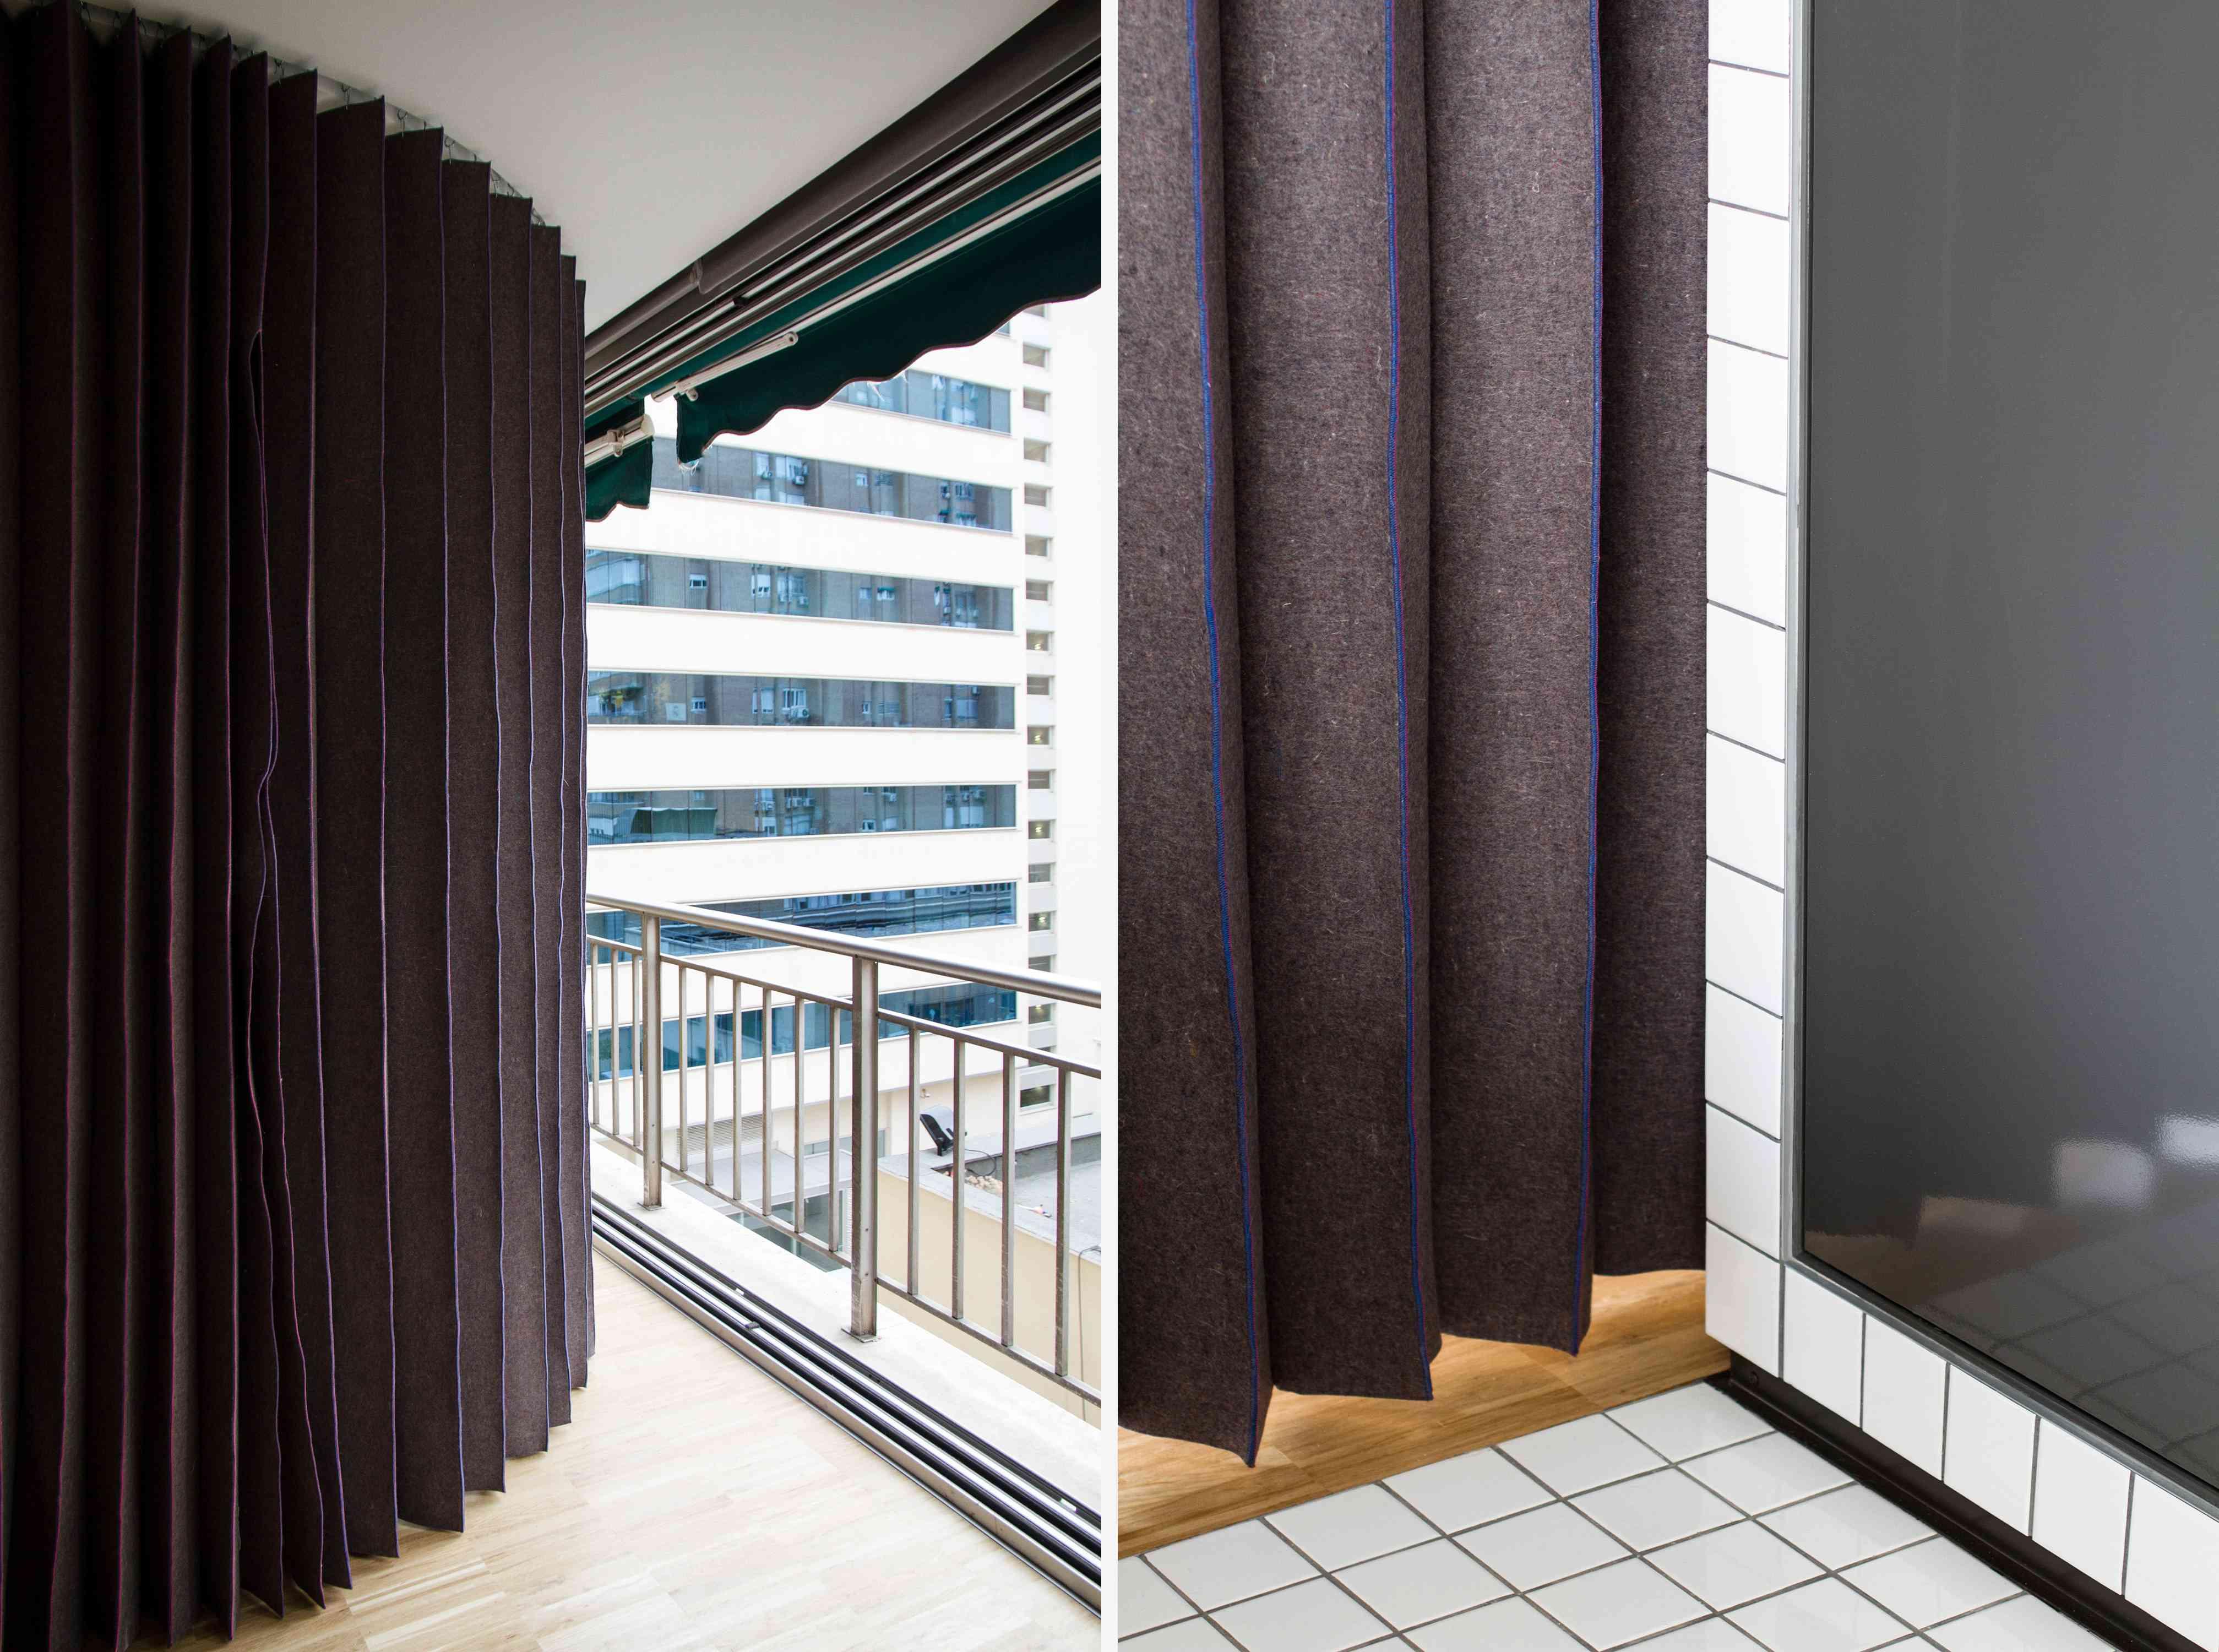 JM55 microapartment renovation by BURR Studio curtain